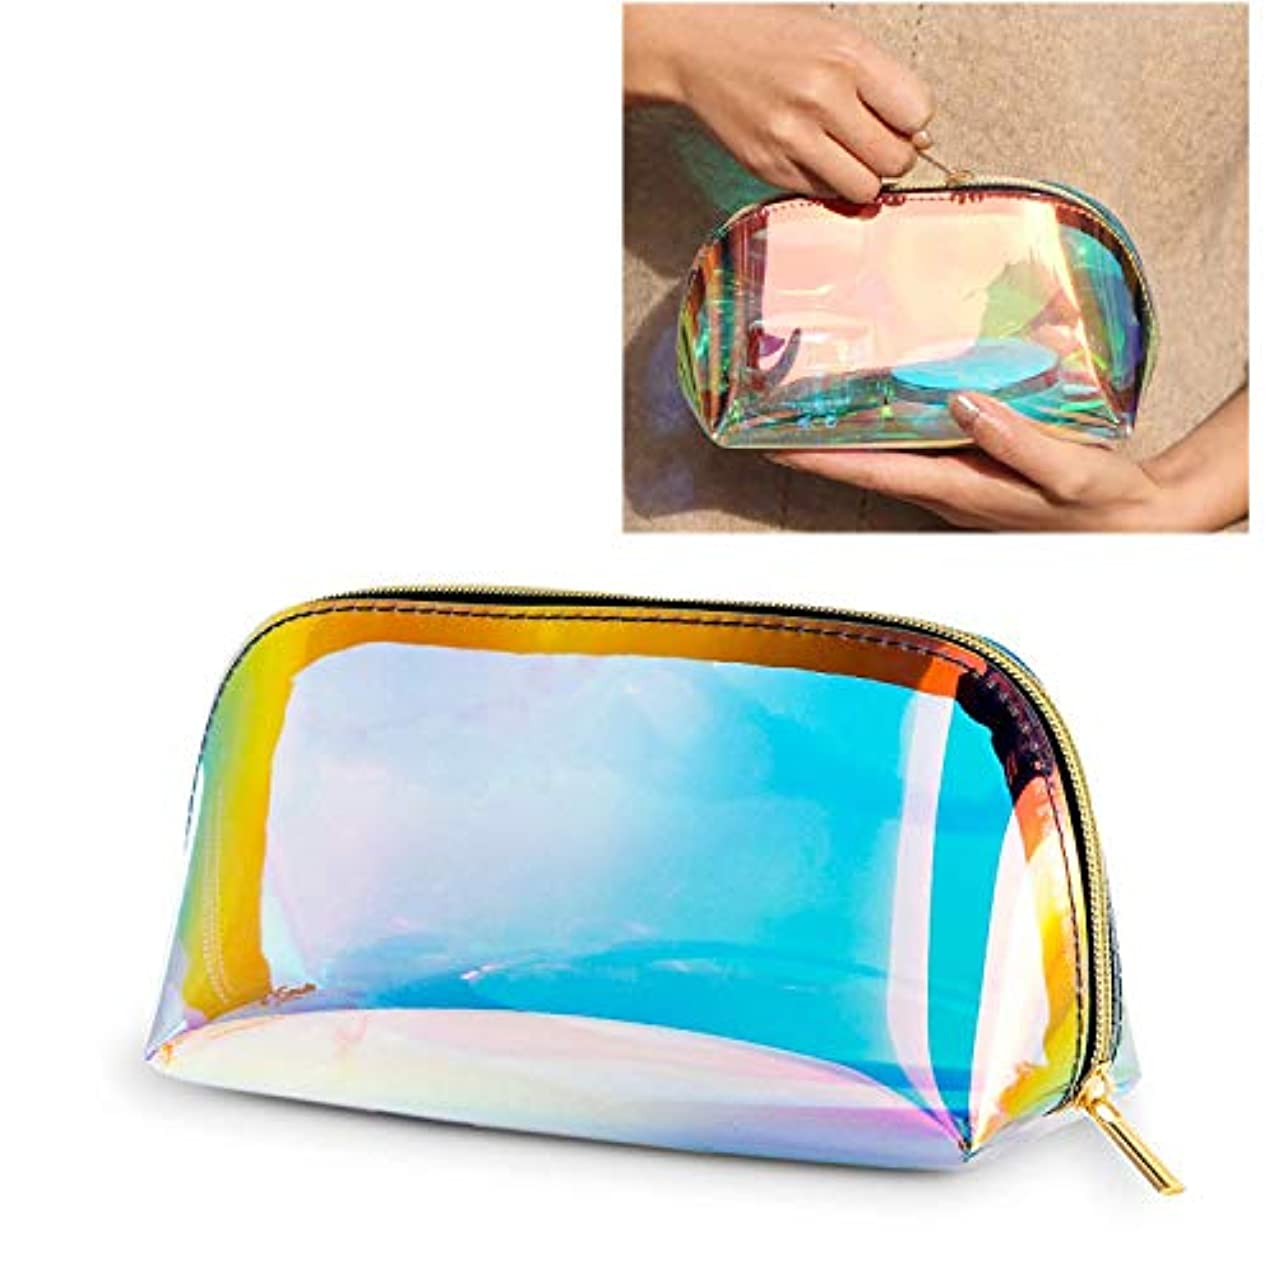 [Huadous]化粧品ポーチ メイクブラシポーチ メイク 収納 ポータブル防水透明pvcメッシュ温泉、ビーチサイド旅行、出張 HZB-001